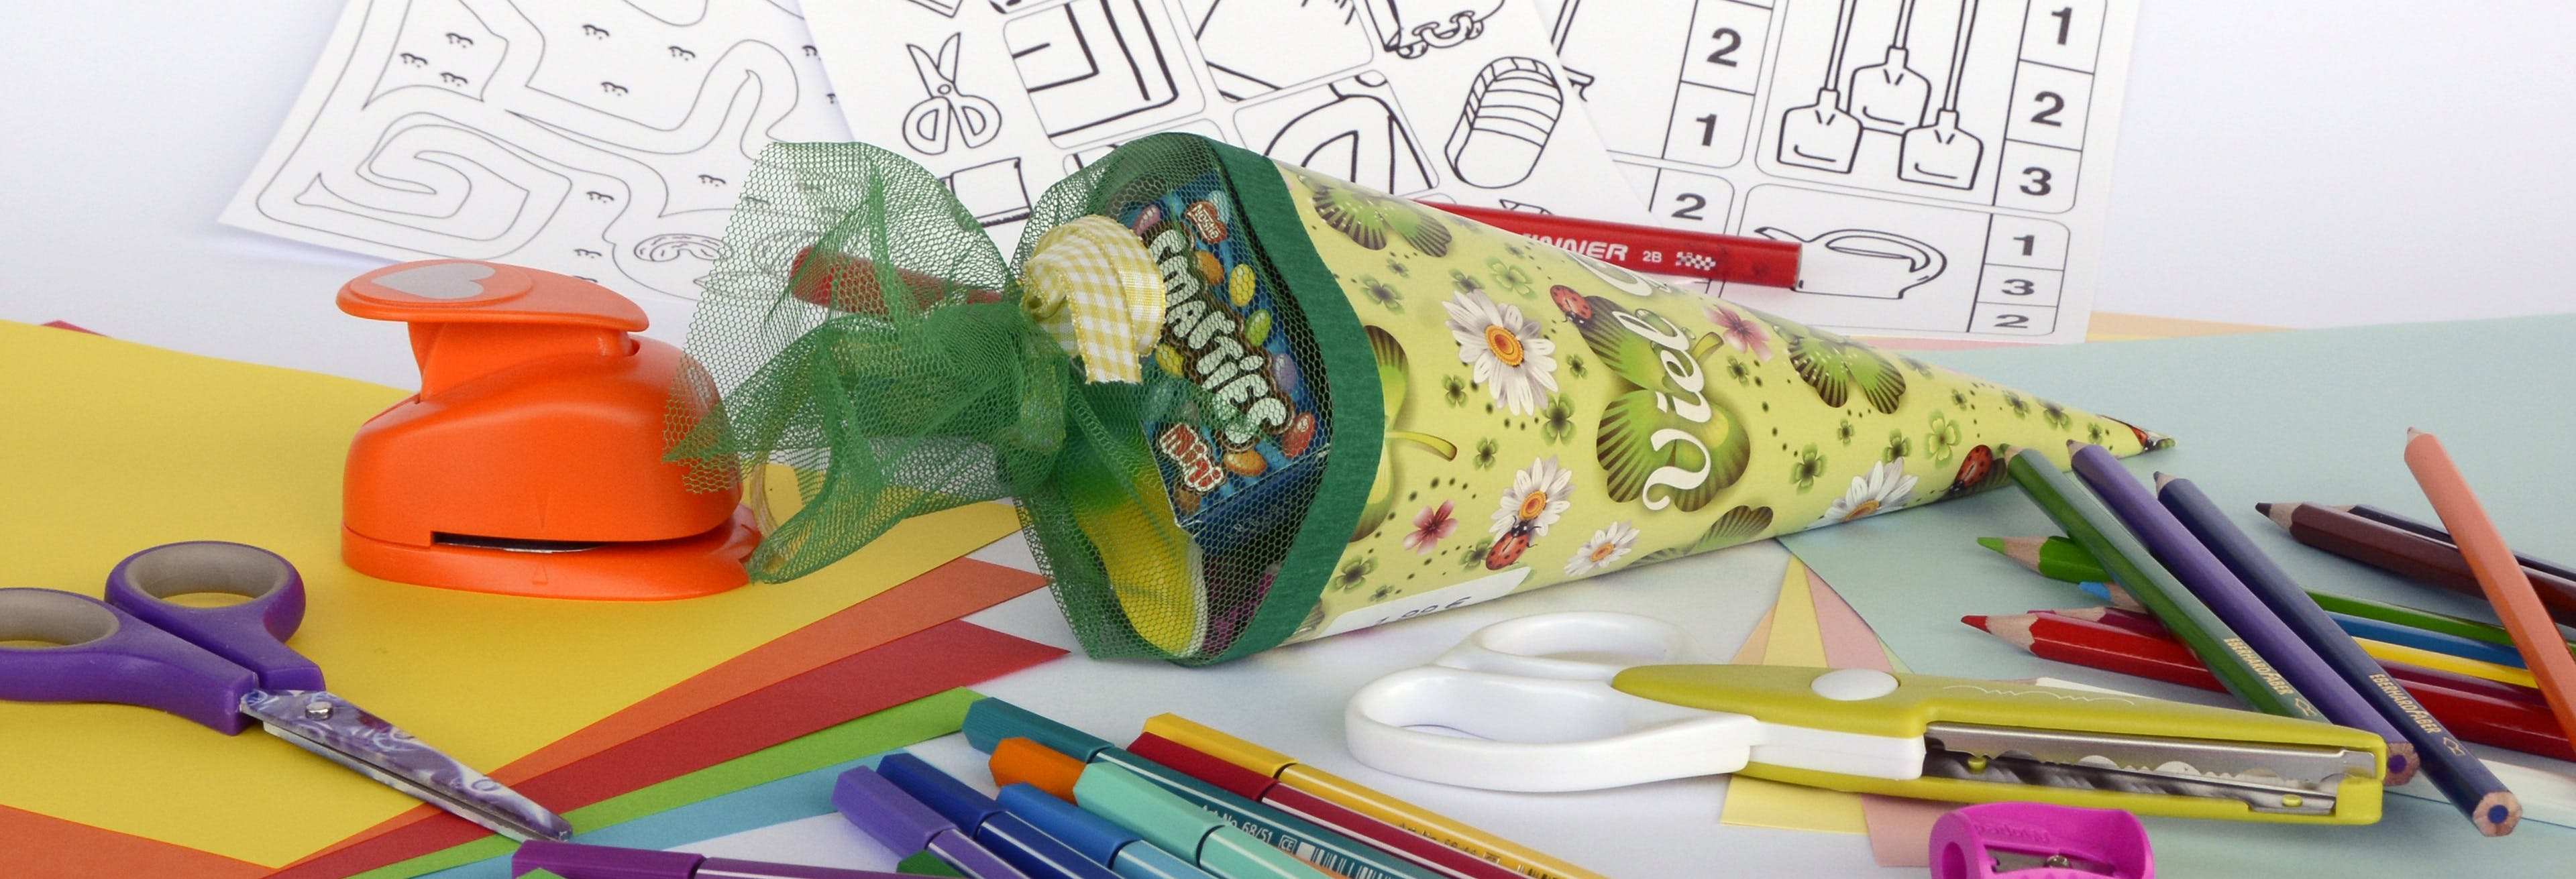 Free stock photo of banner, pencil, pens, school